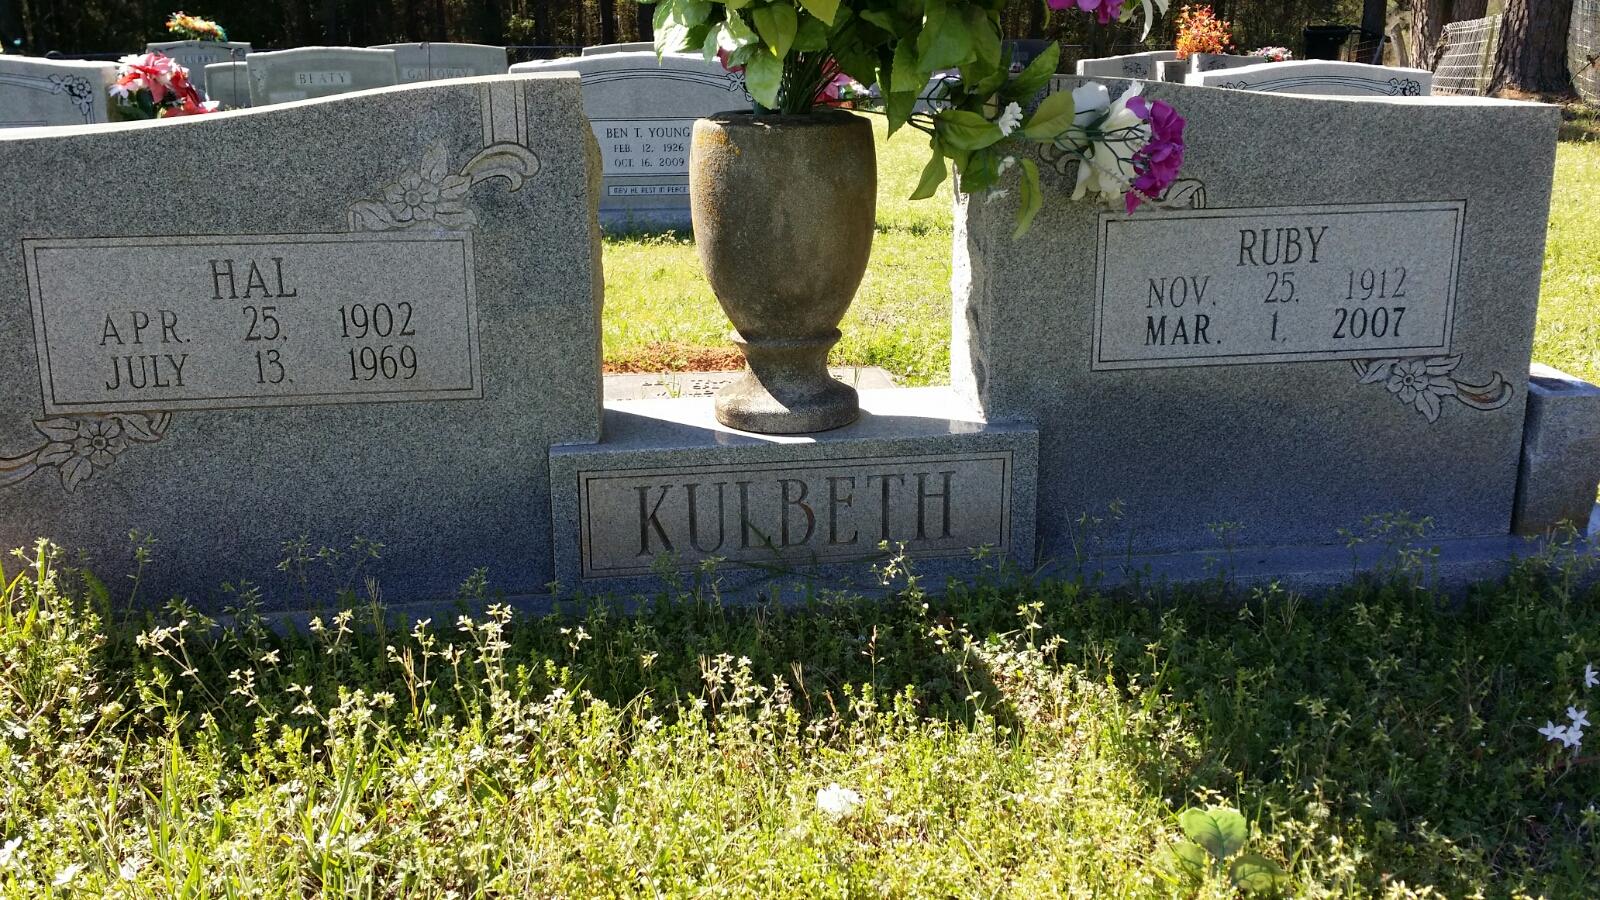 Hal Kulbeth